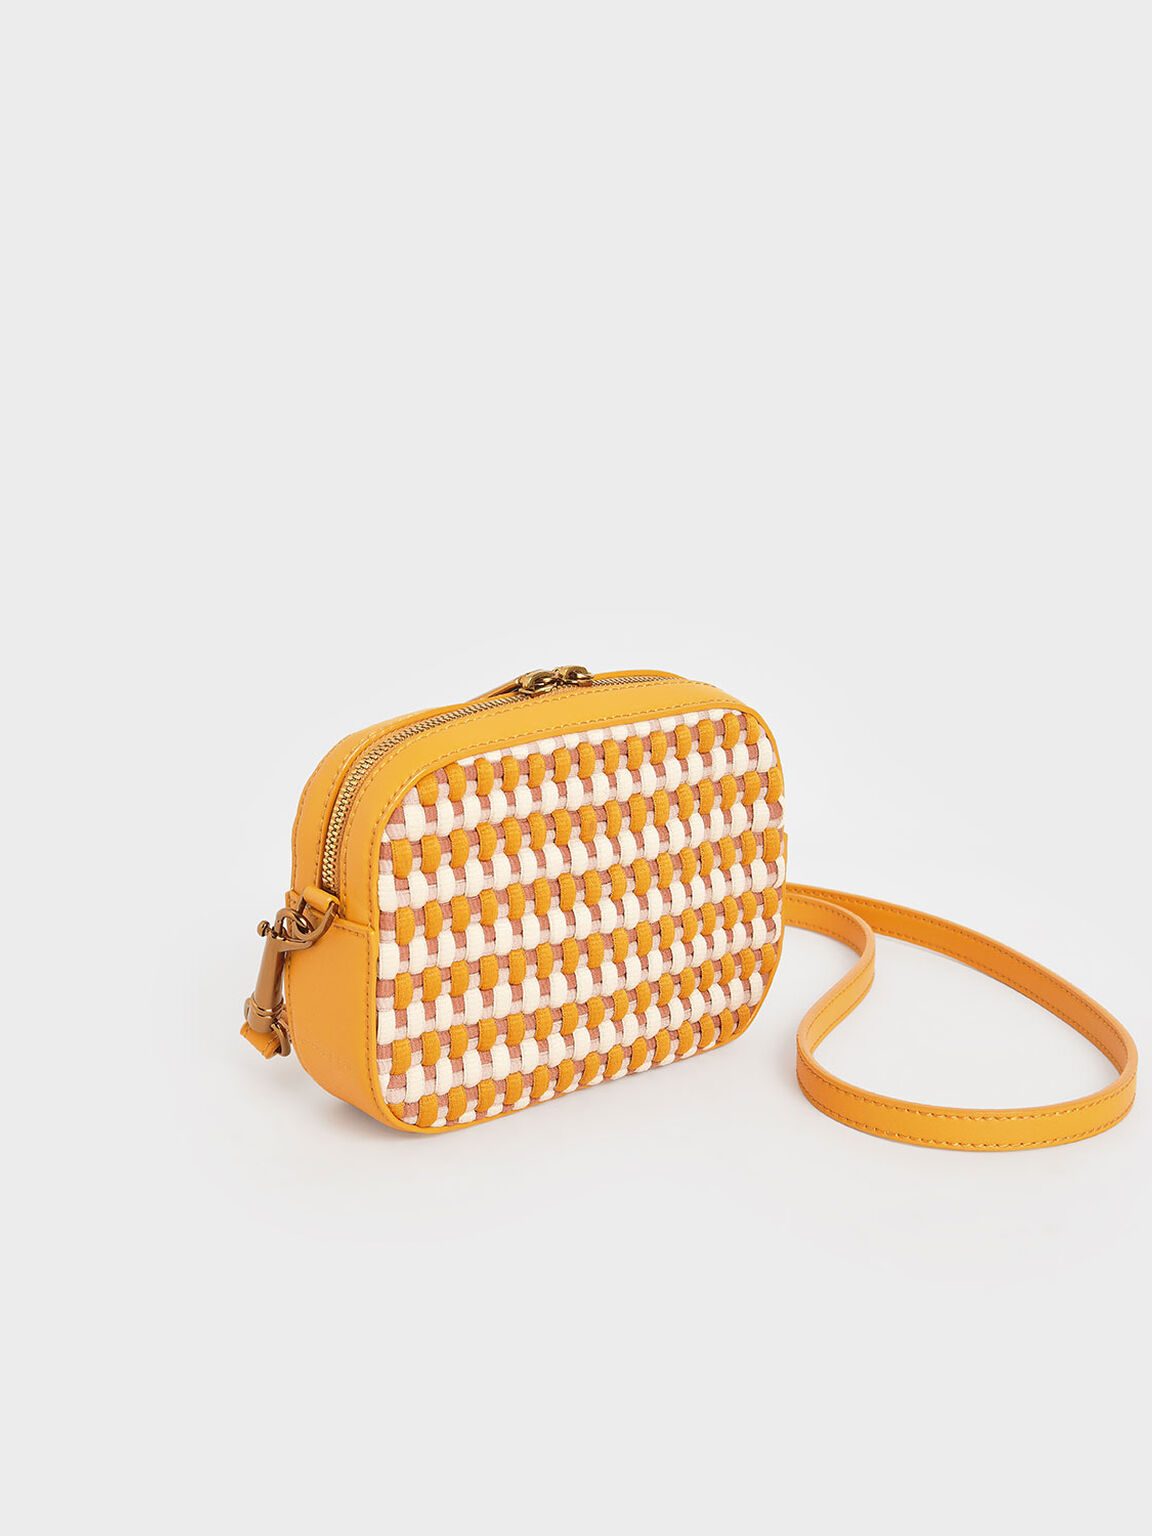 Multicoloured Woven Crossbody Bag, Mustard, hi-res